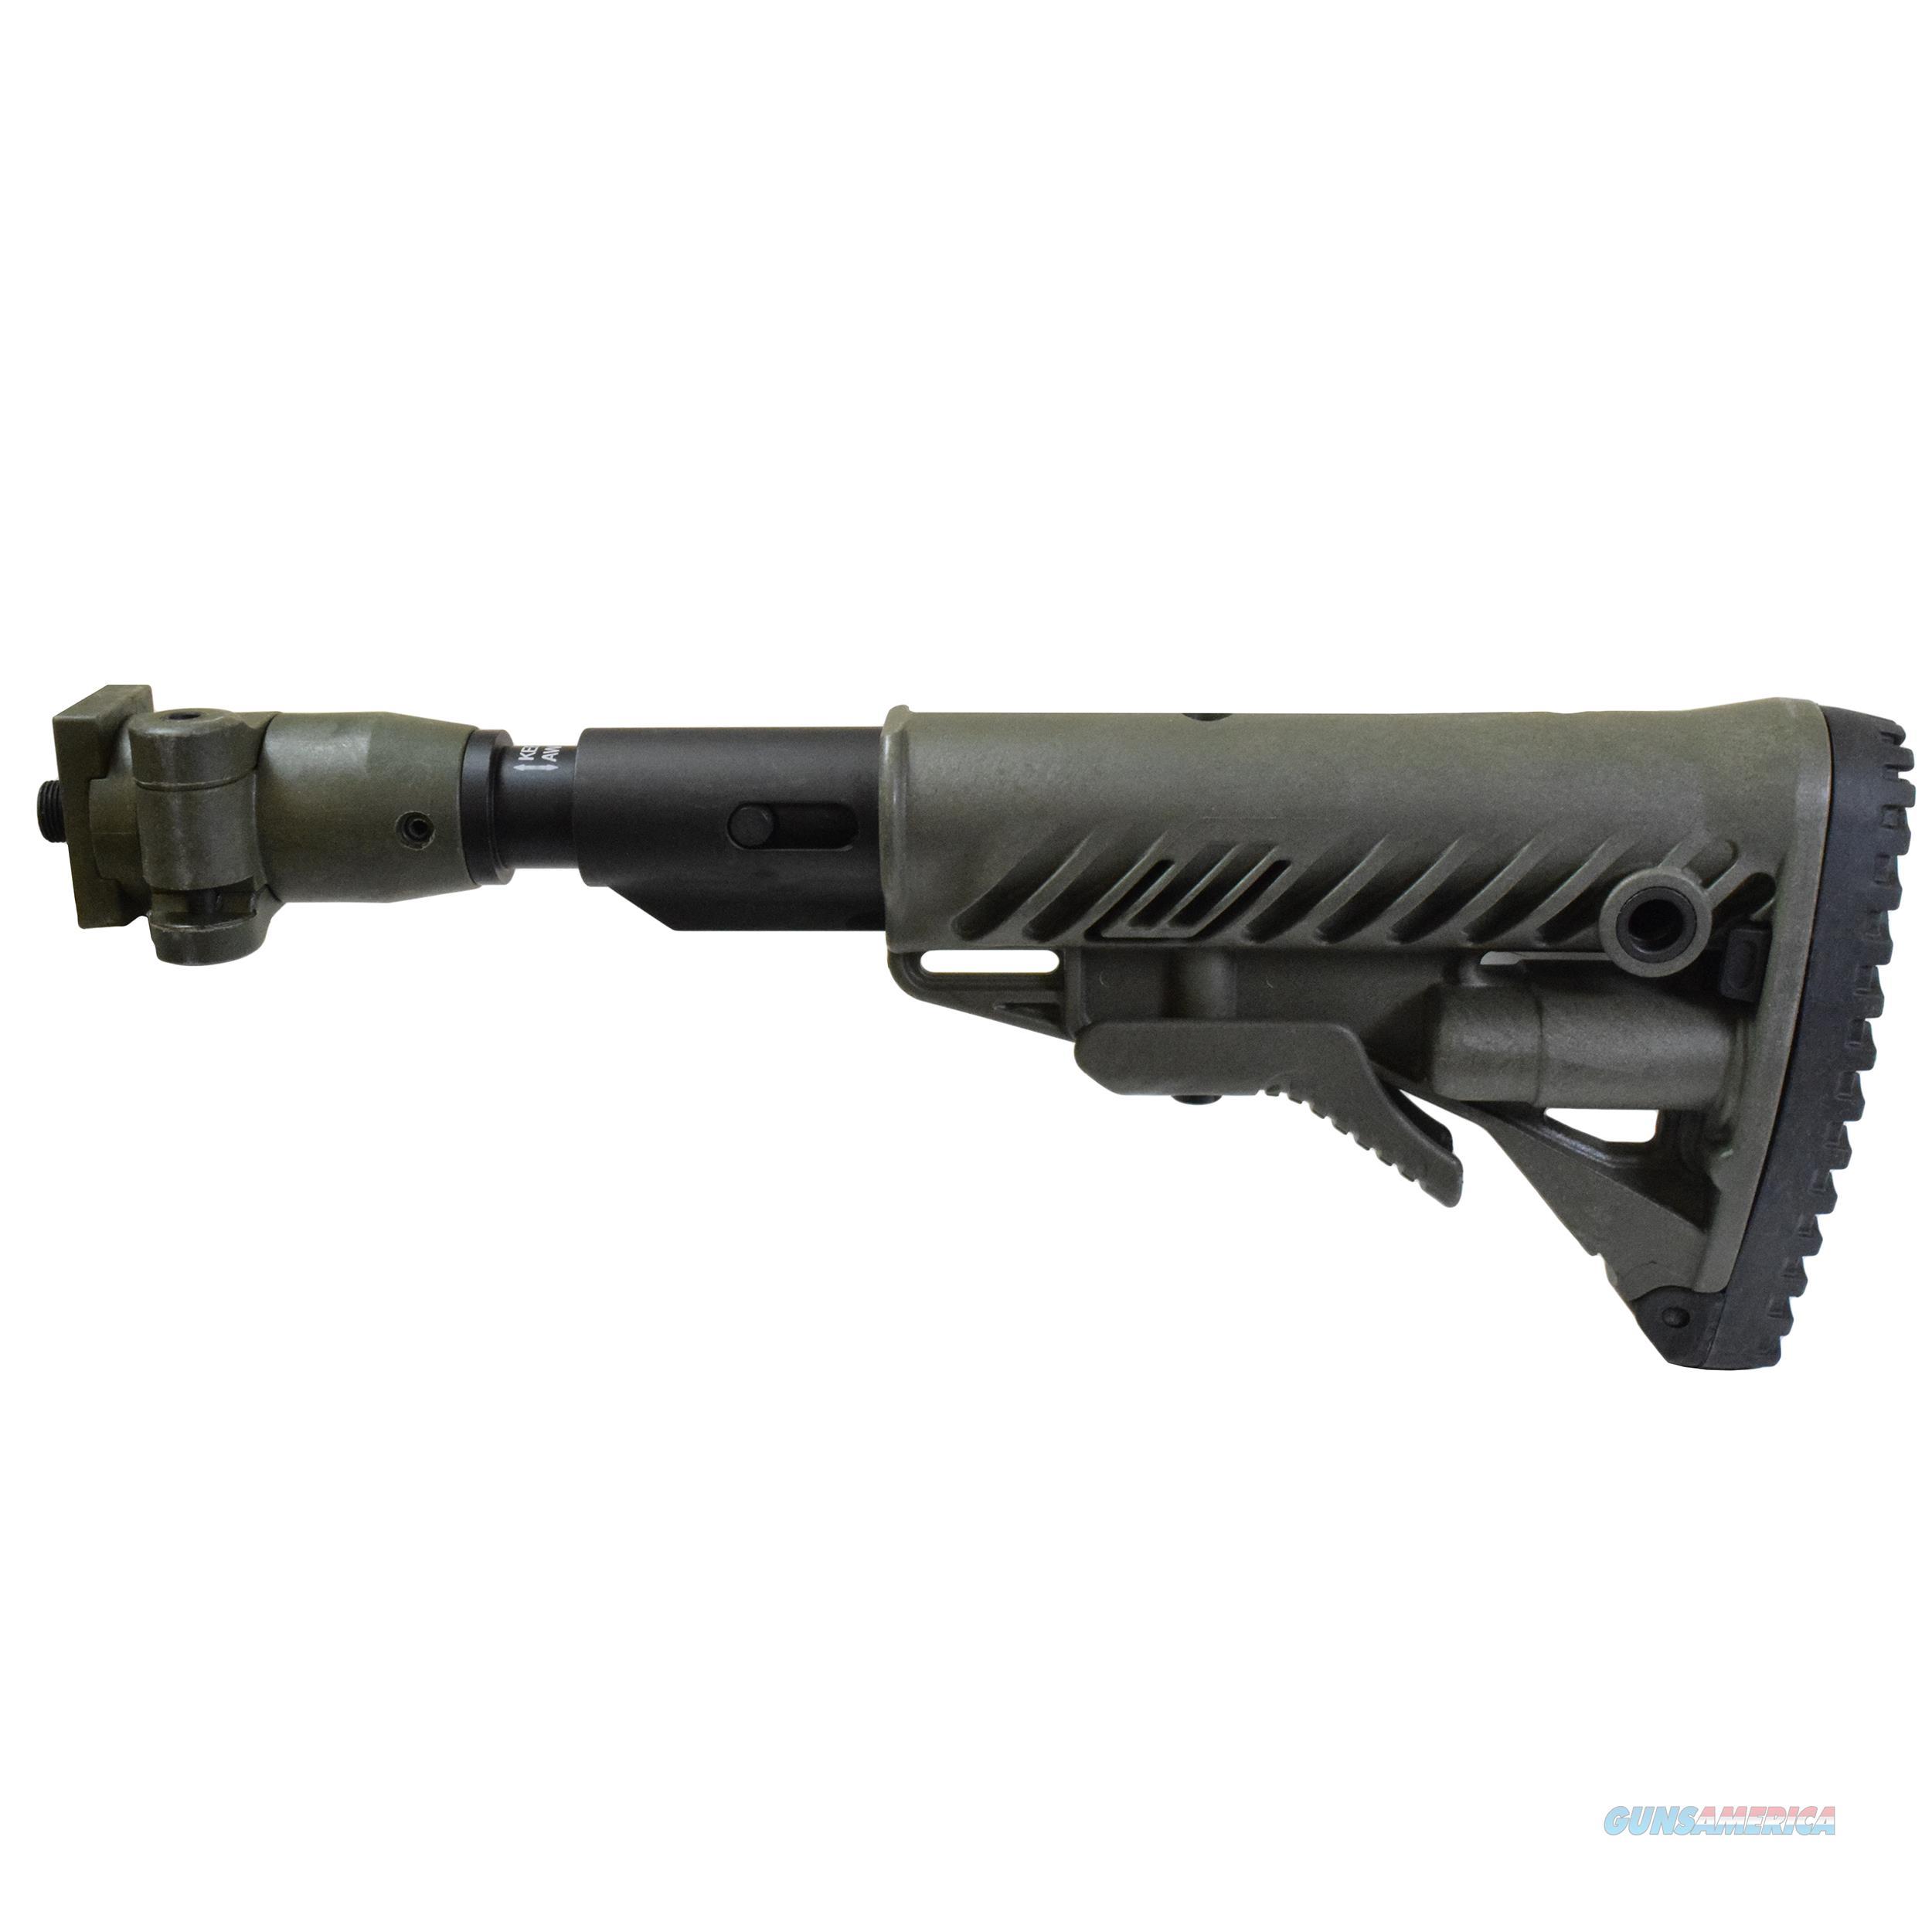 Mako Group Galil Style Recoil Compensating Folding Collapsible Buttstock System M4VZ SB-OD  Non-Guns > Gunstocks, Grips & Wood